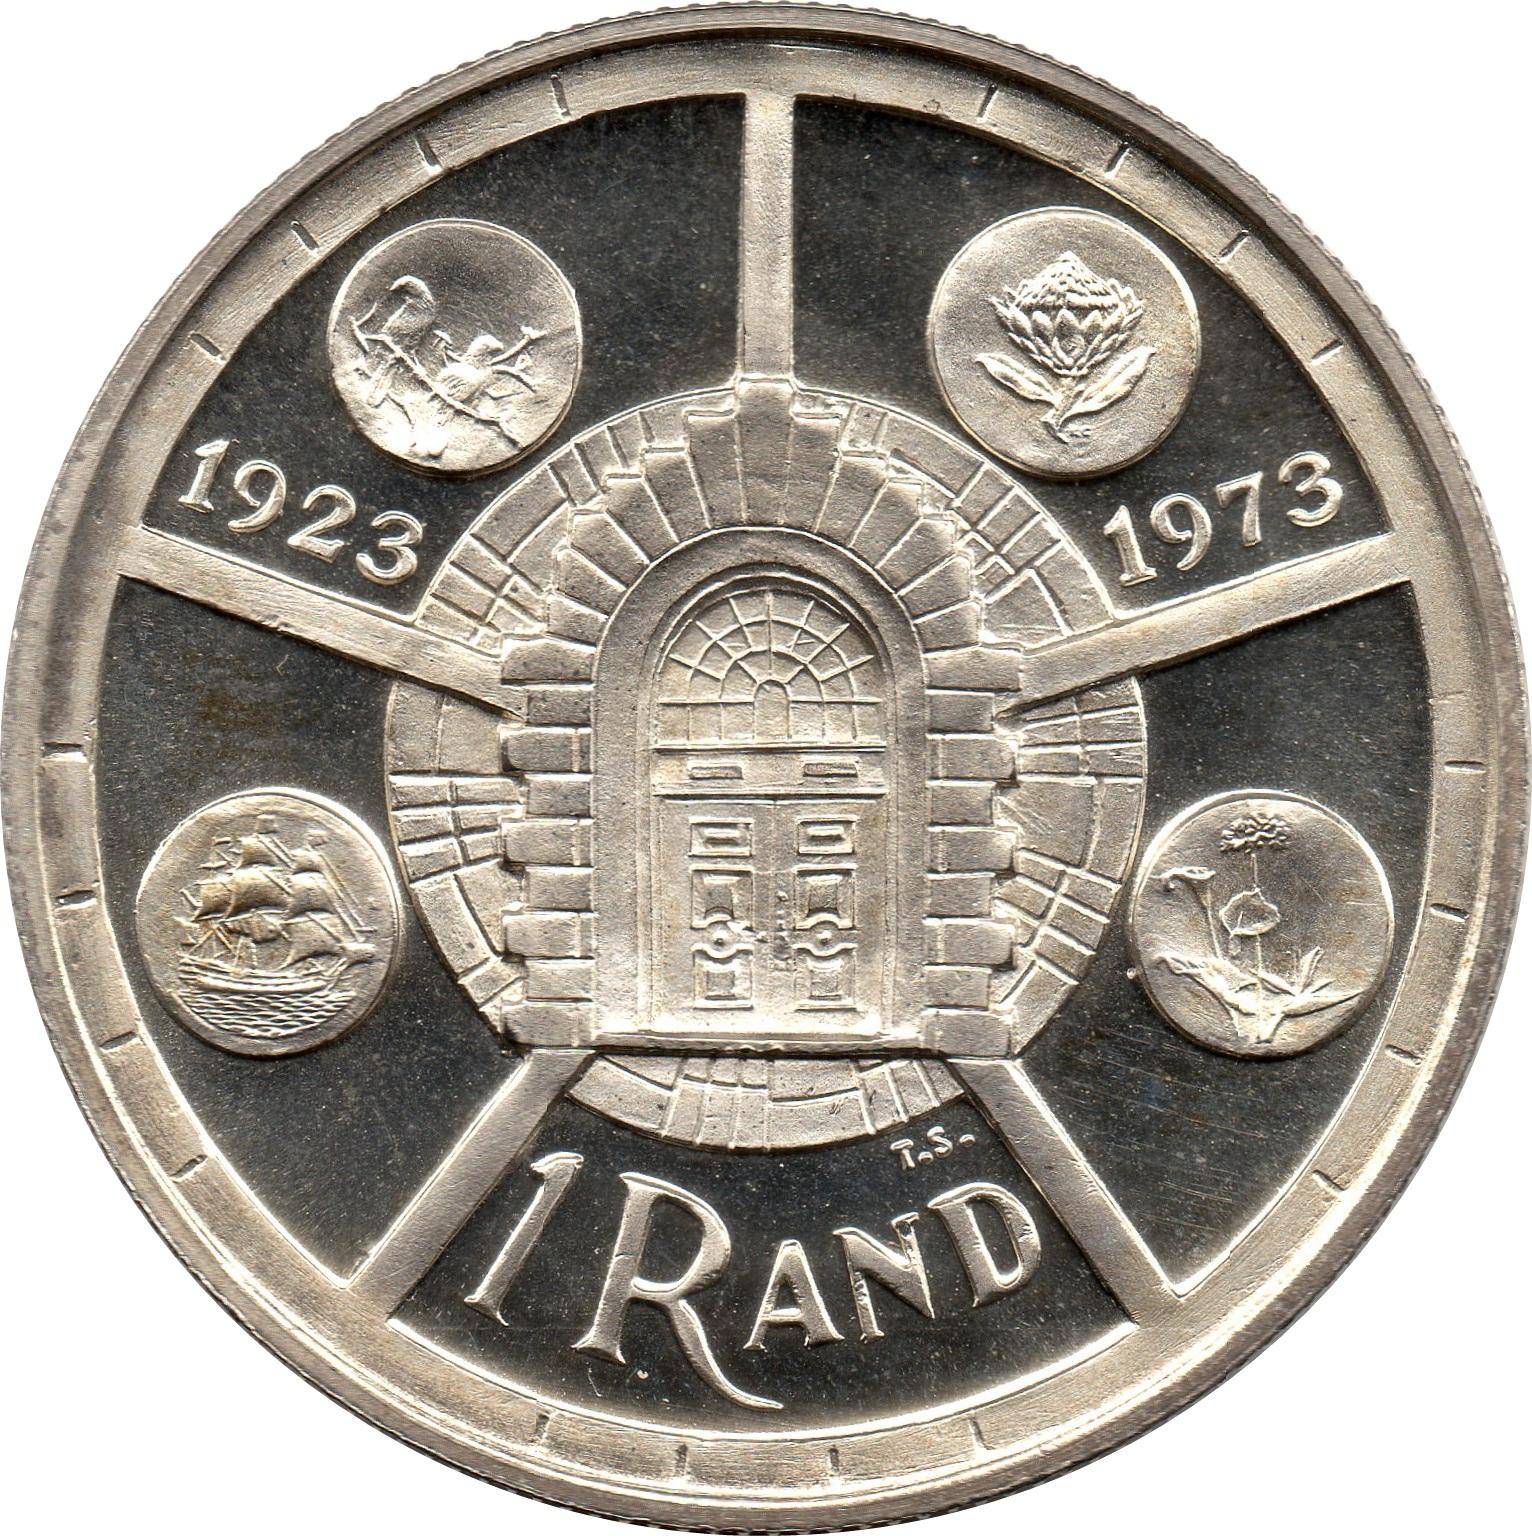 1 Rand Anniversary Of Pretoria Mint South Africa Numista